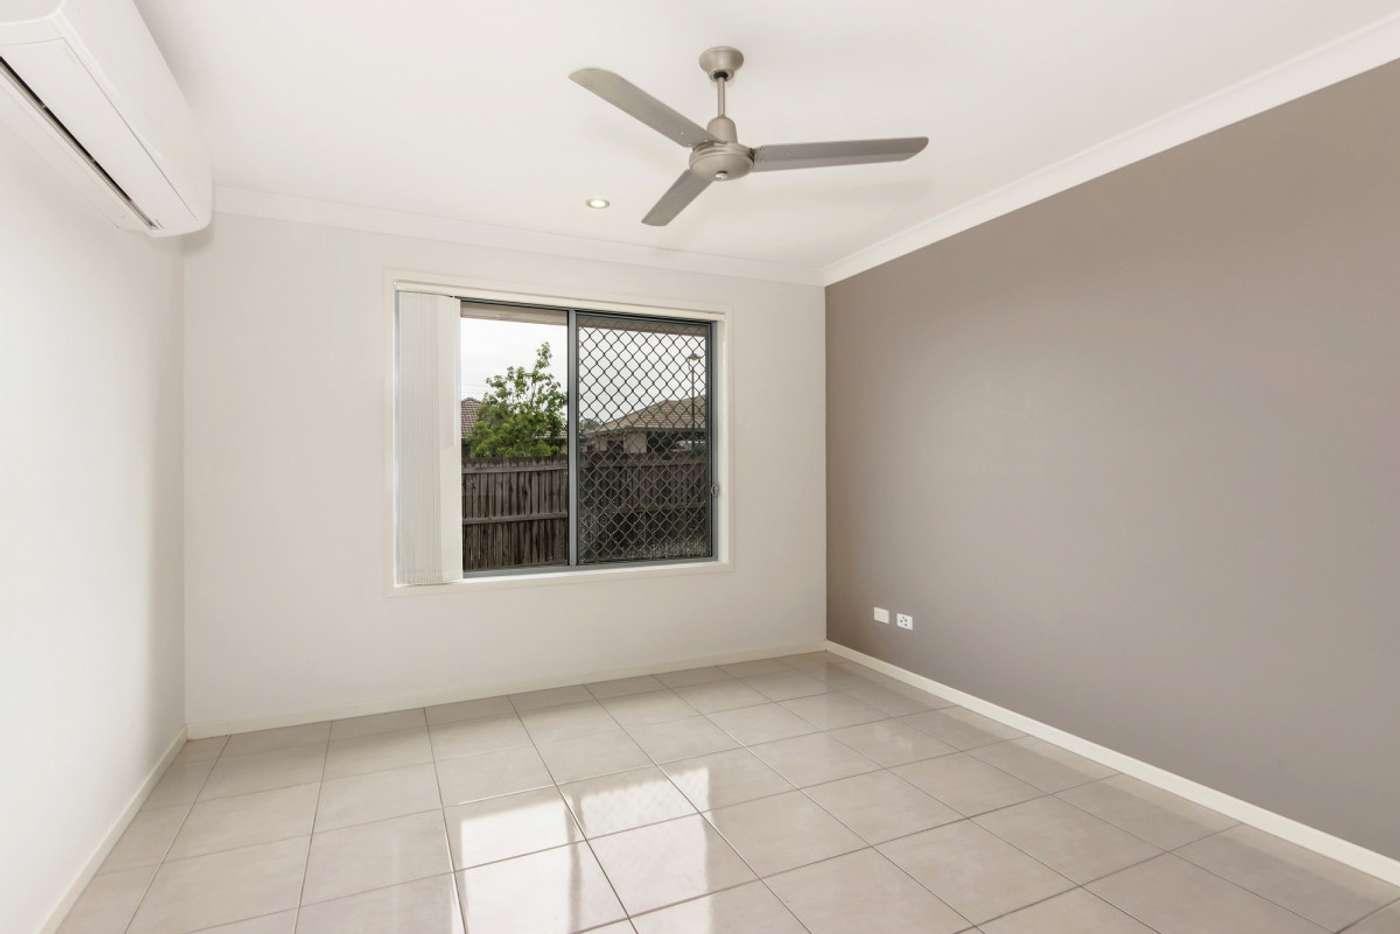 Seventh view of Homely house listing, 9 Denman Drive, Bundamba QLD 4304